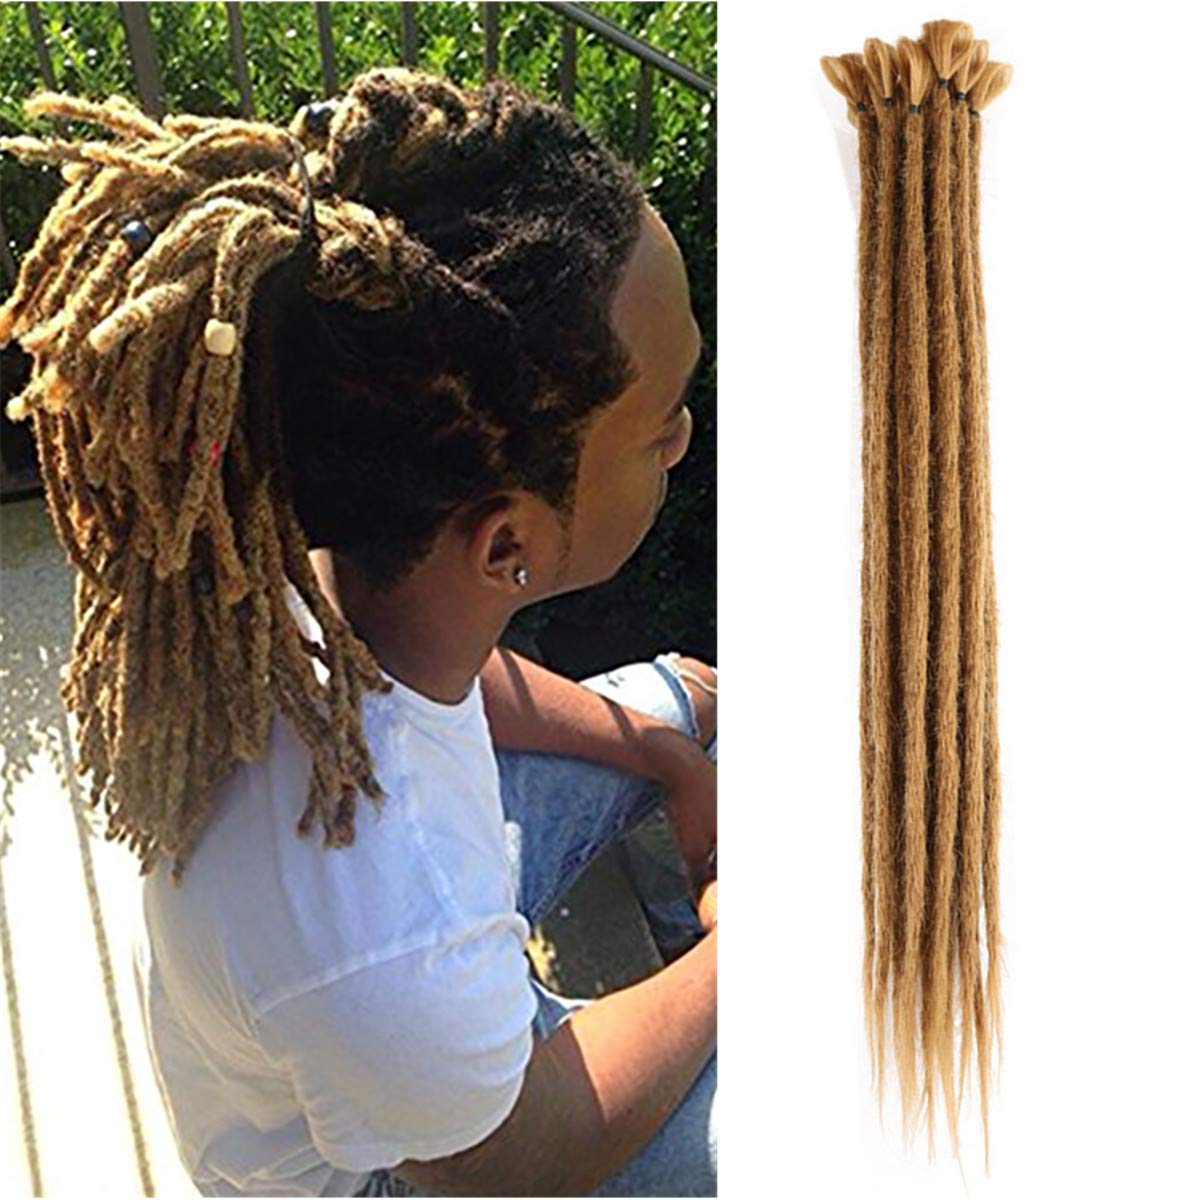 20 x dark brown Highest Quality Human Hair Dreadlock extensions 12 inches long